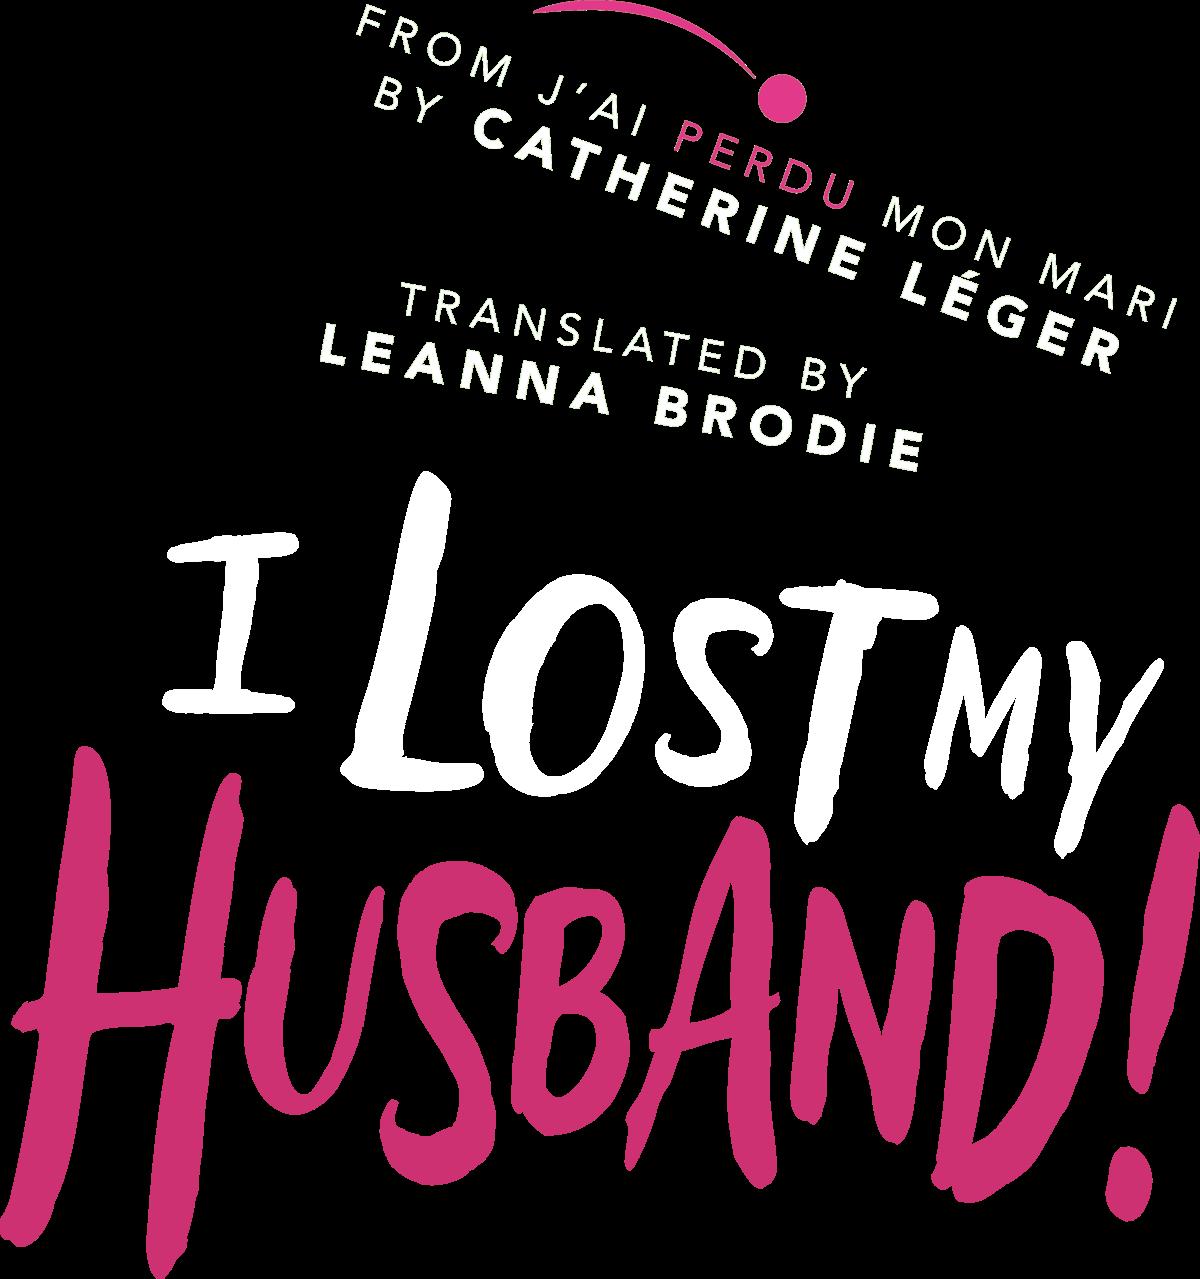 I Lost My Husband!